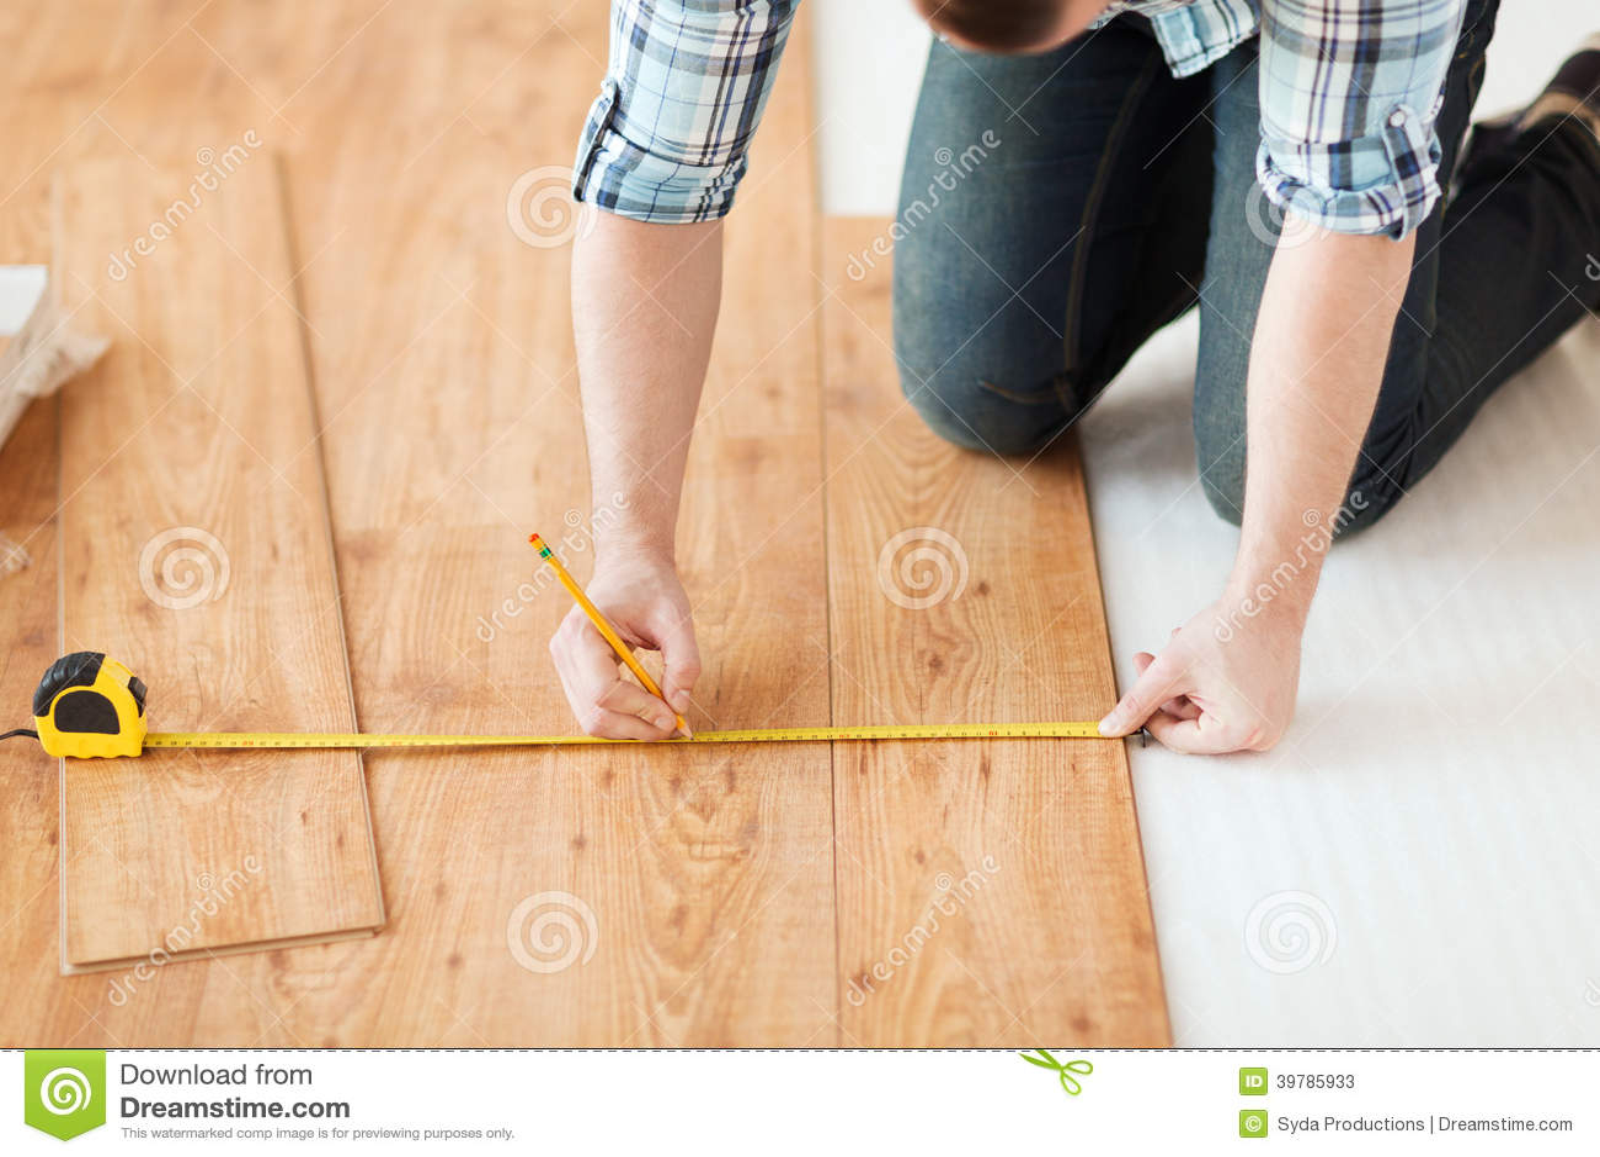 close up of male hands measuring wood flooring stock image. Black Bedroom Furniture Sets. Home Design Ideas